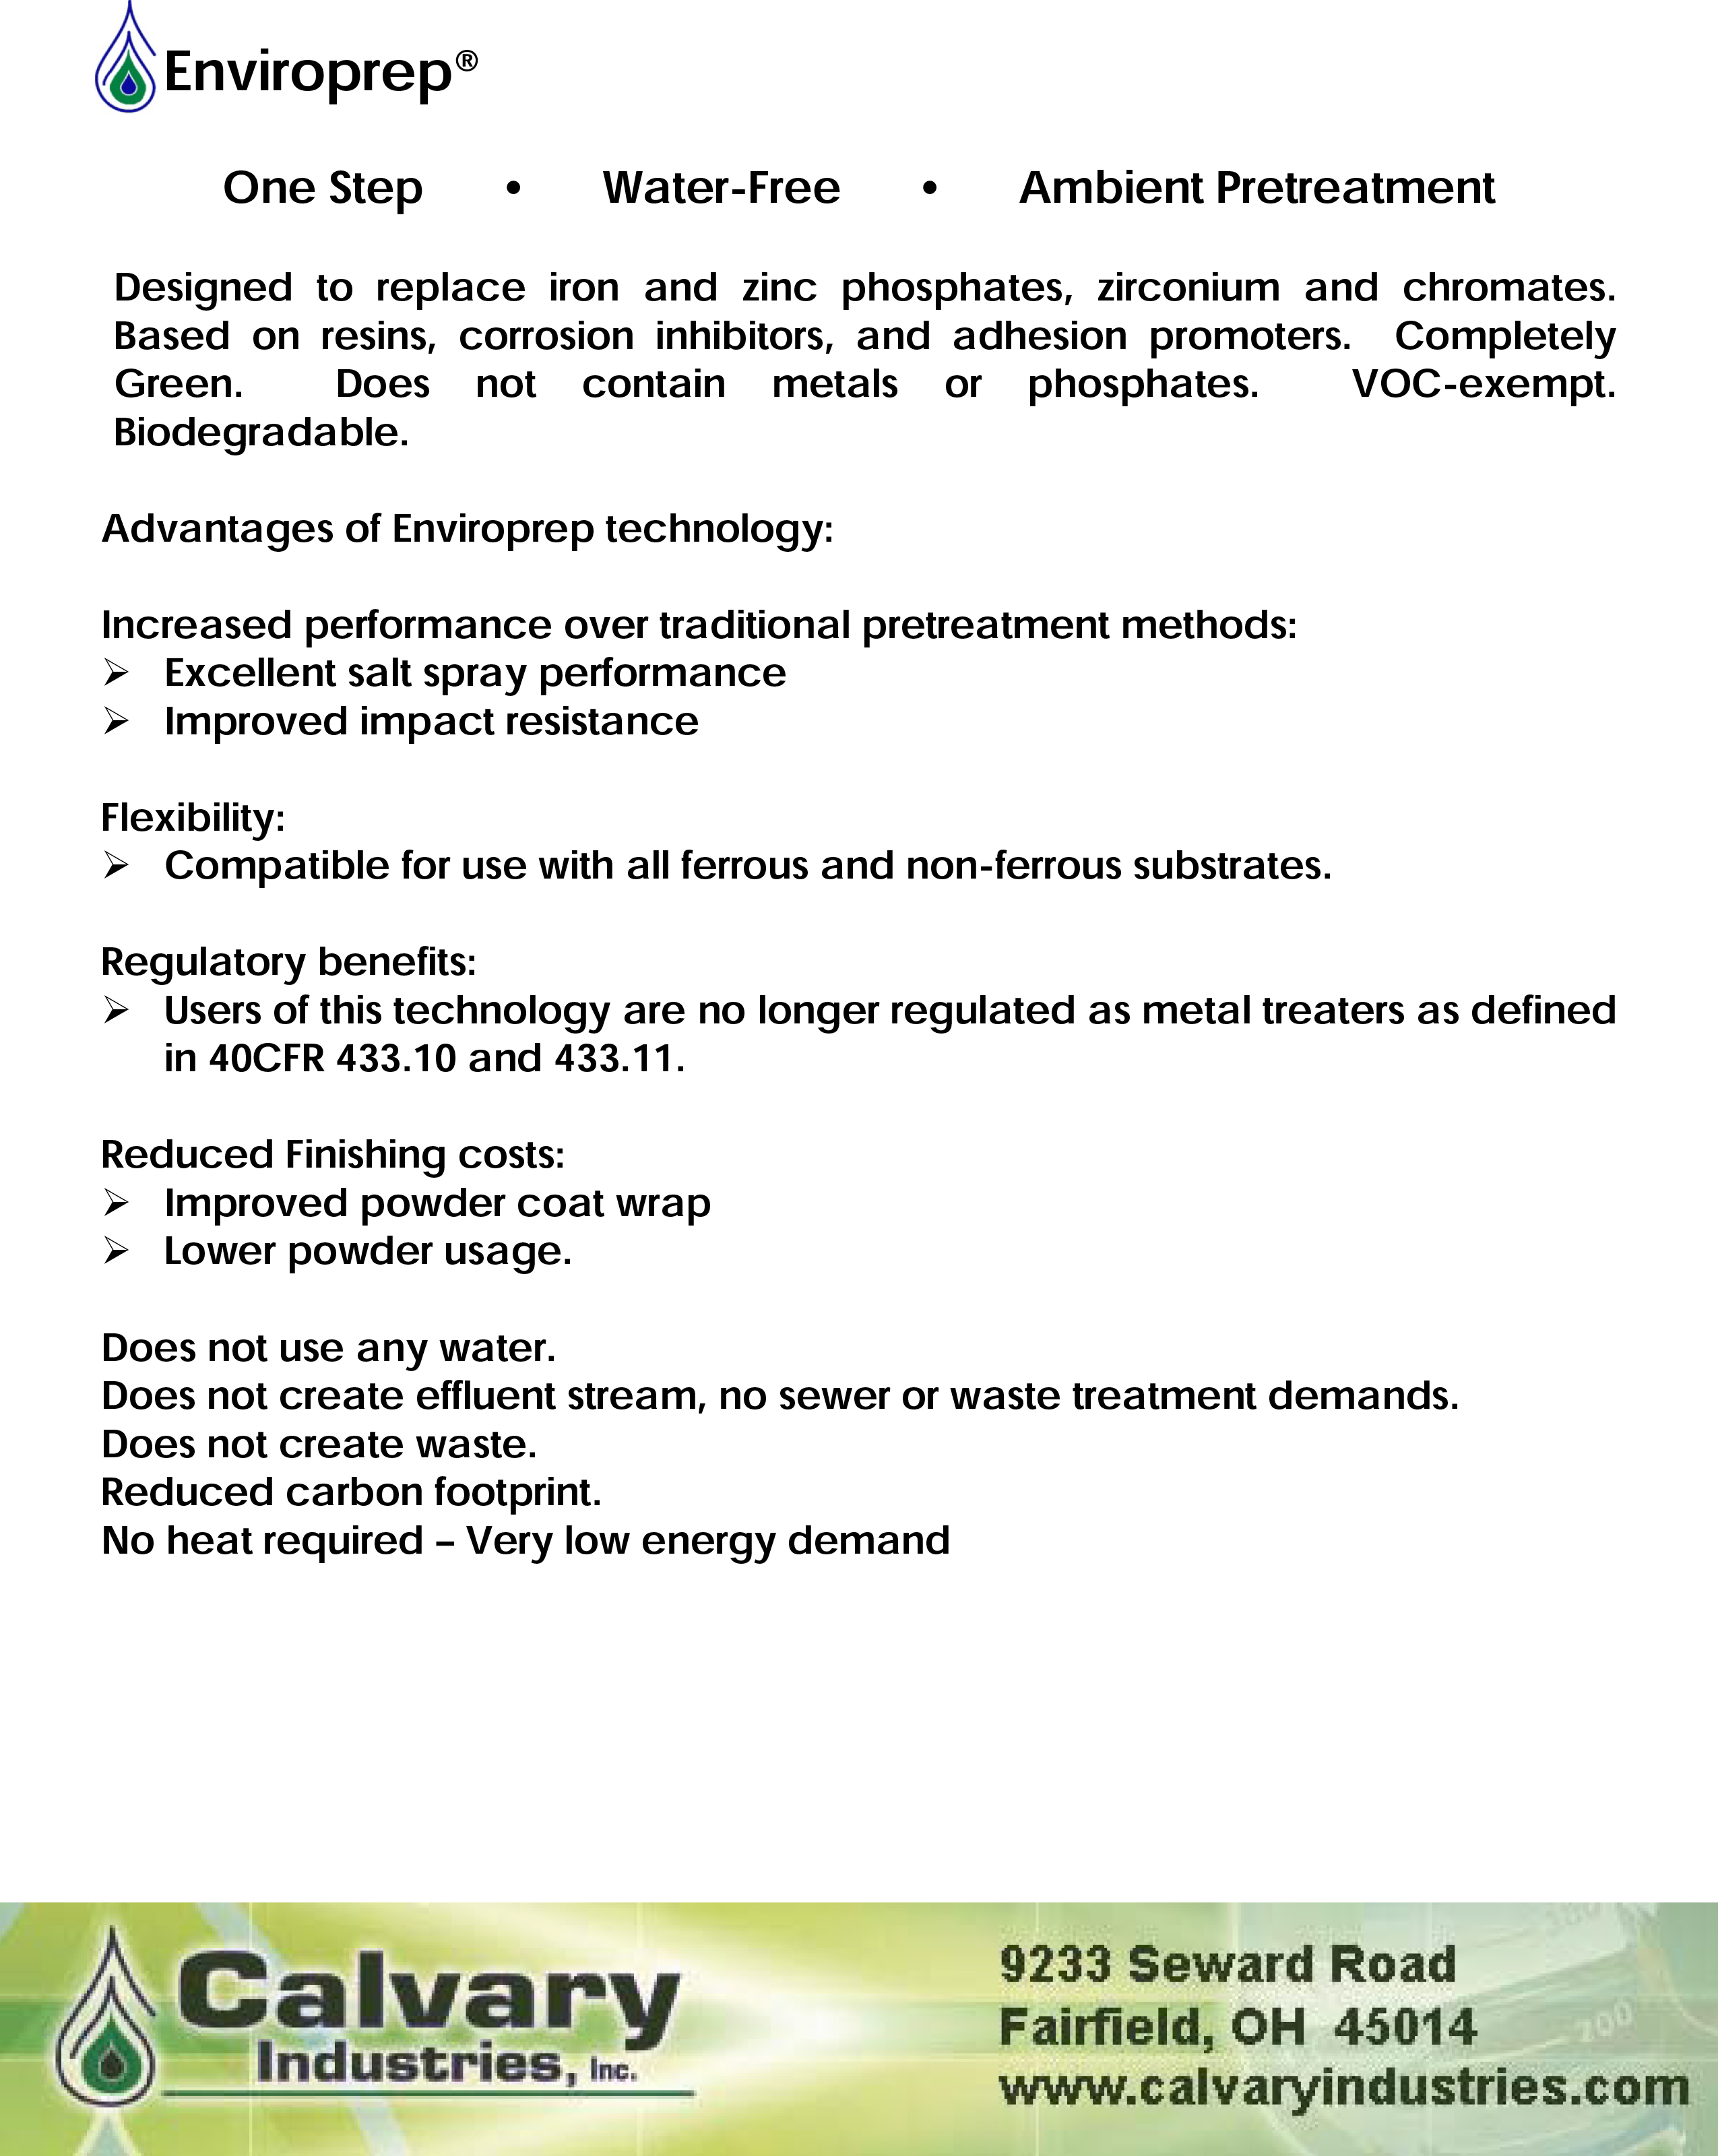 Enviroprep-brochure